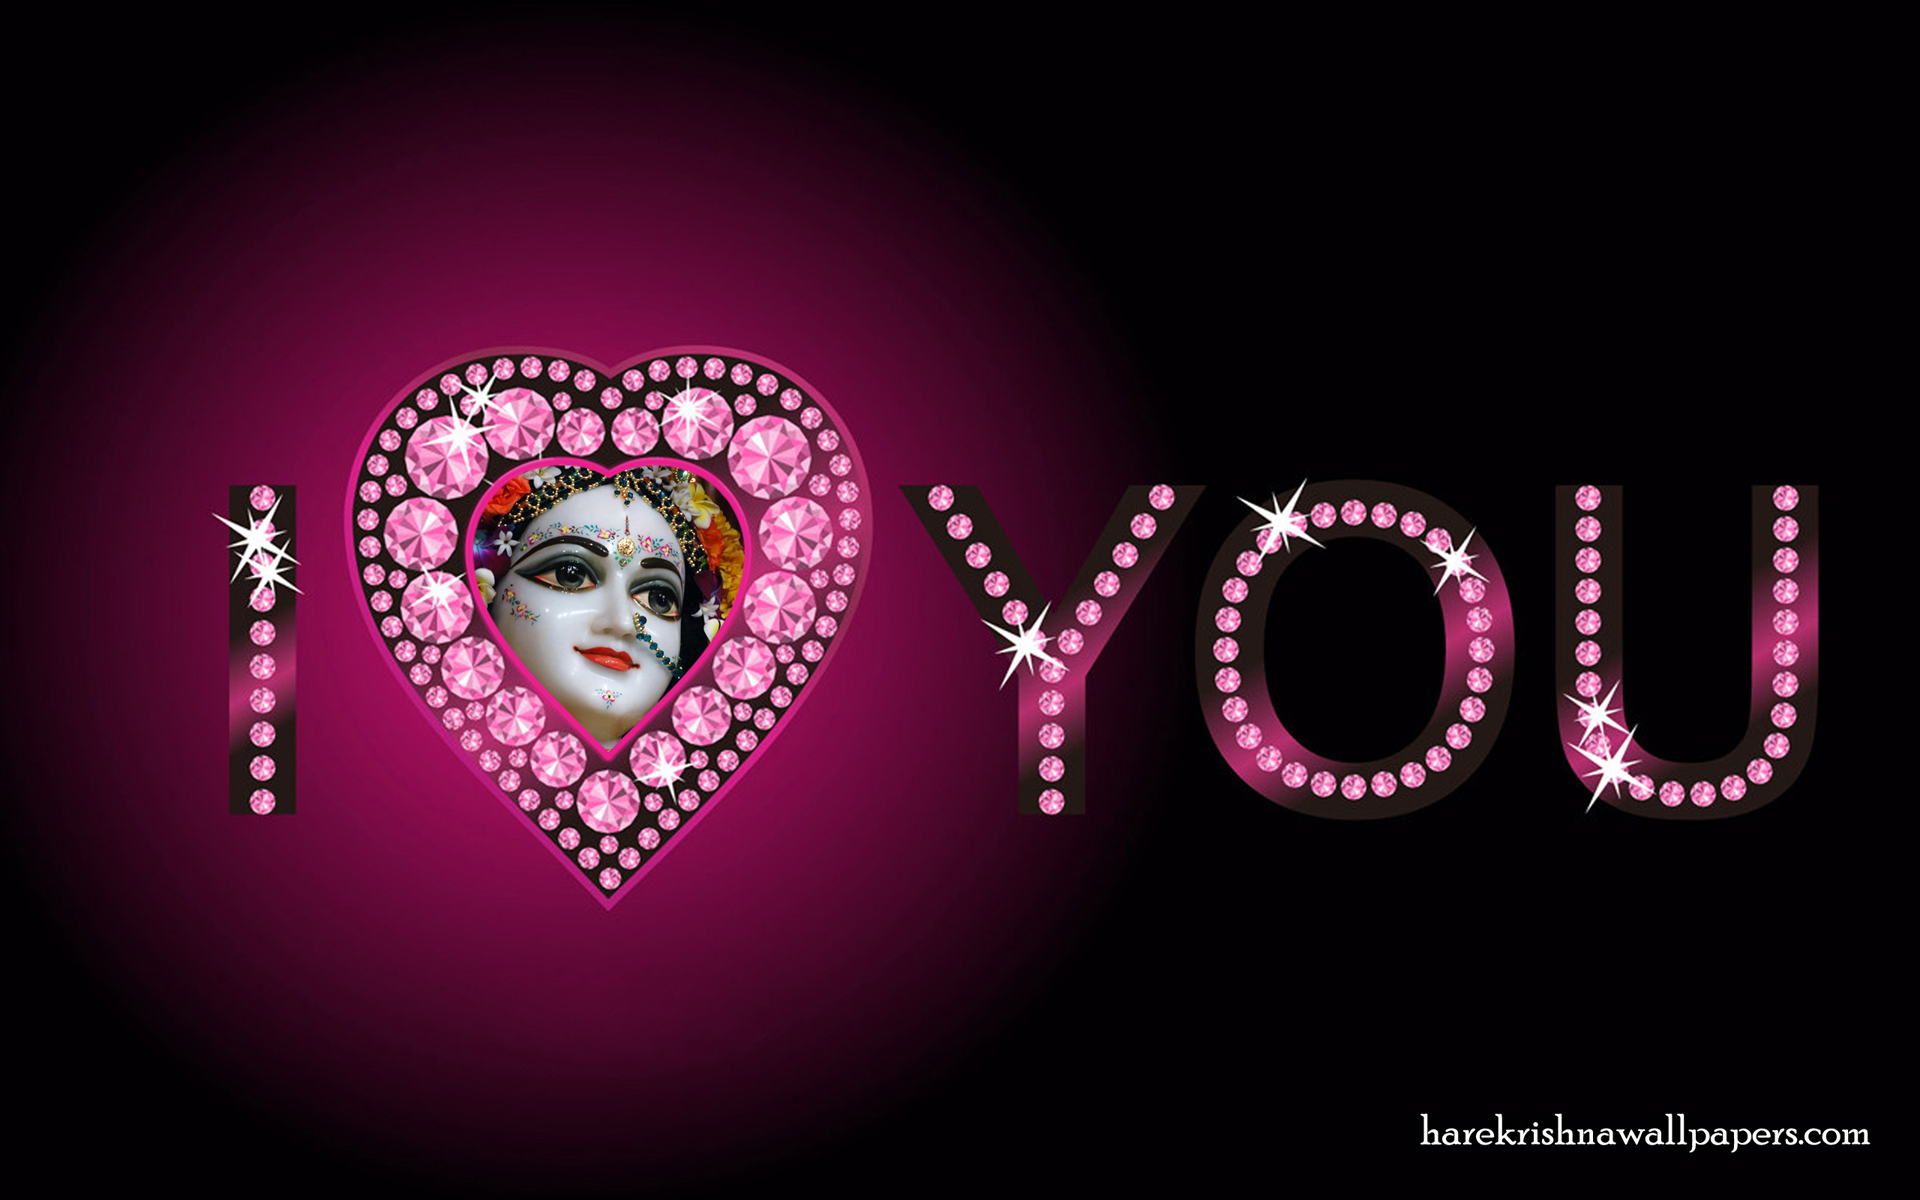 I Love You Radharani Wallpaper (013) Size 1920x1200 Download